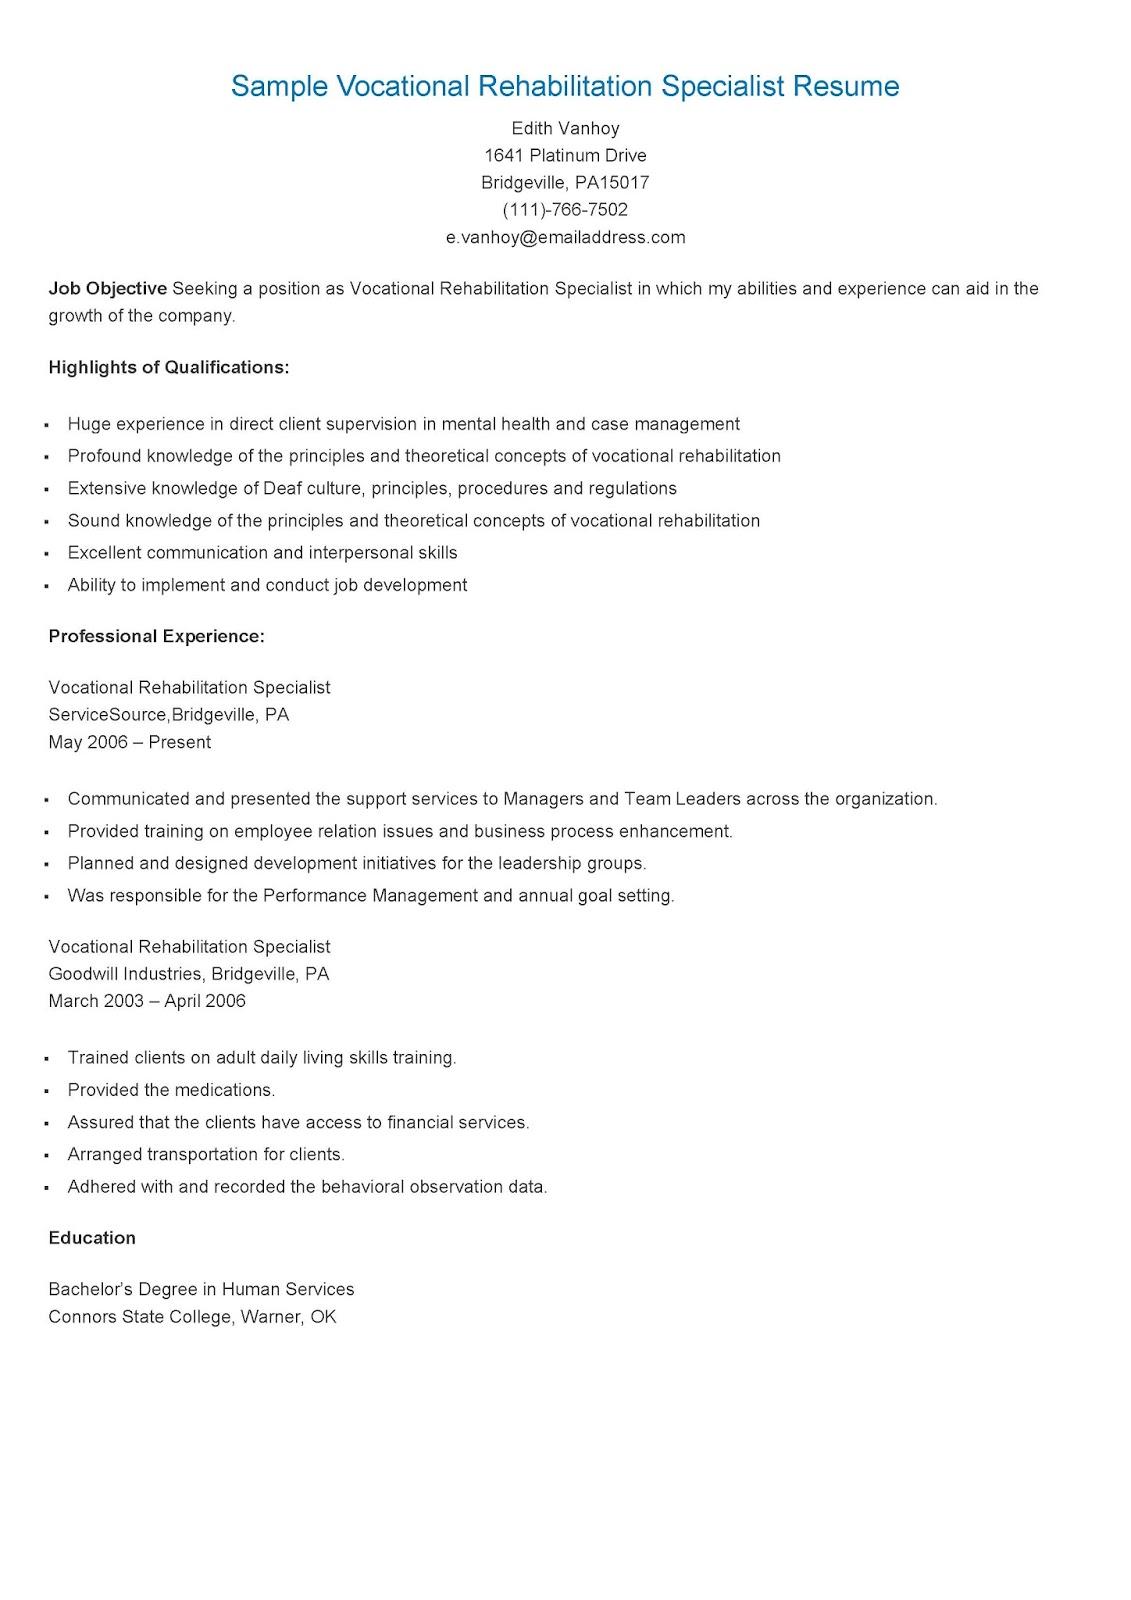 samples sample vocational rehabilitation specialist